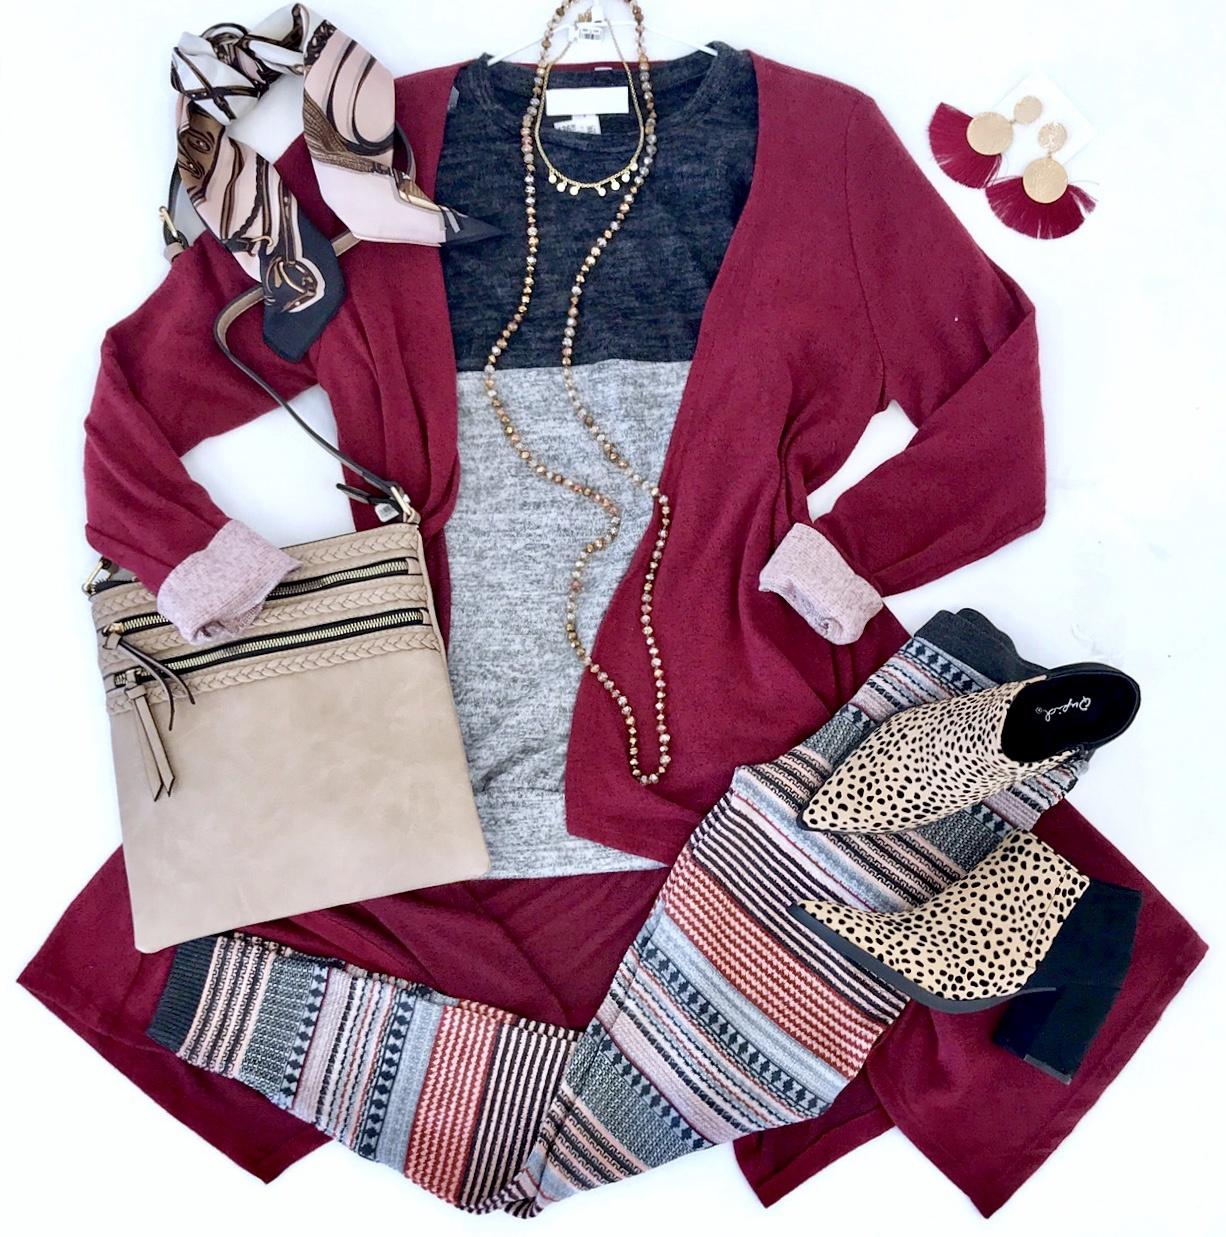 Burgundy Soft and Cozy Cardigan